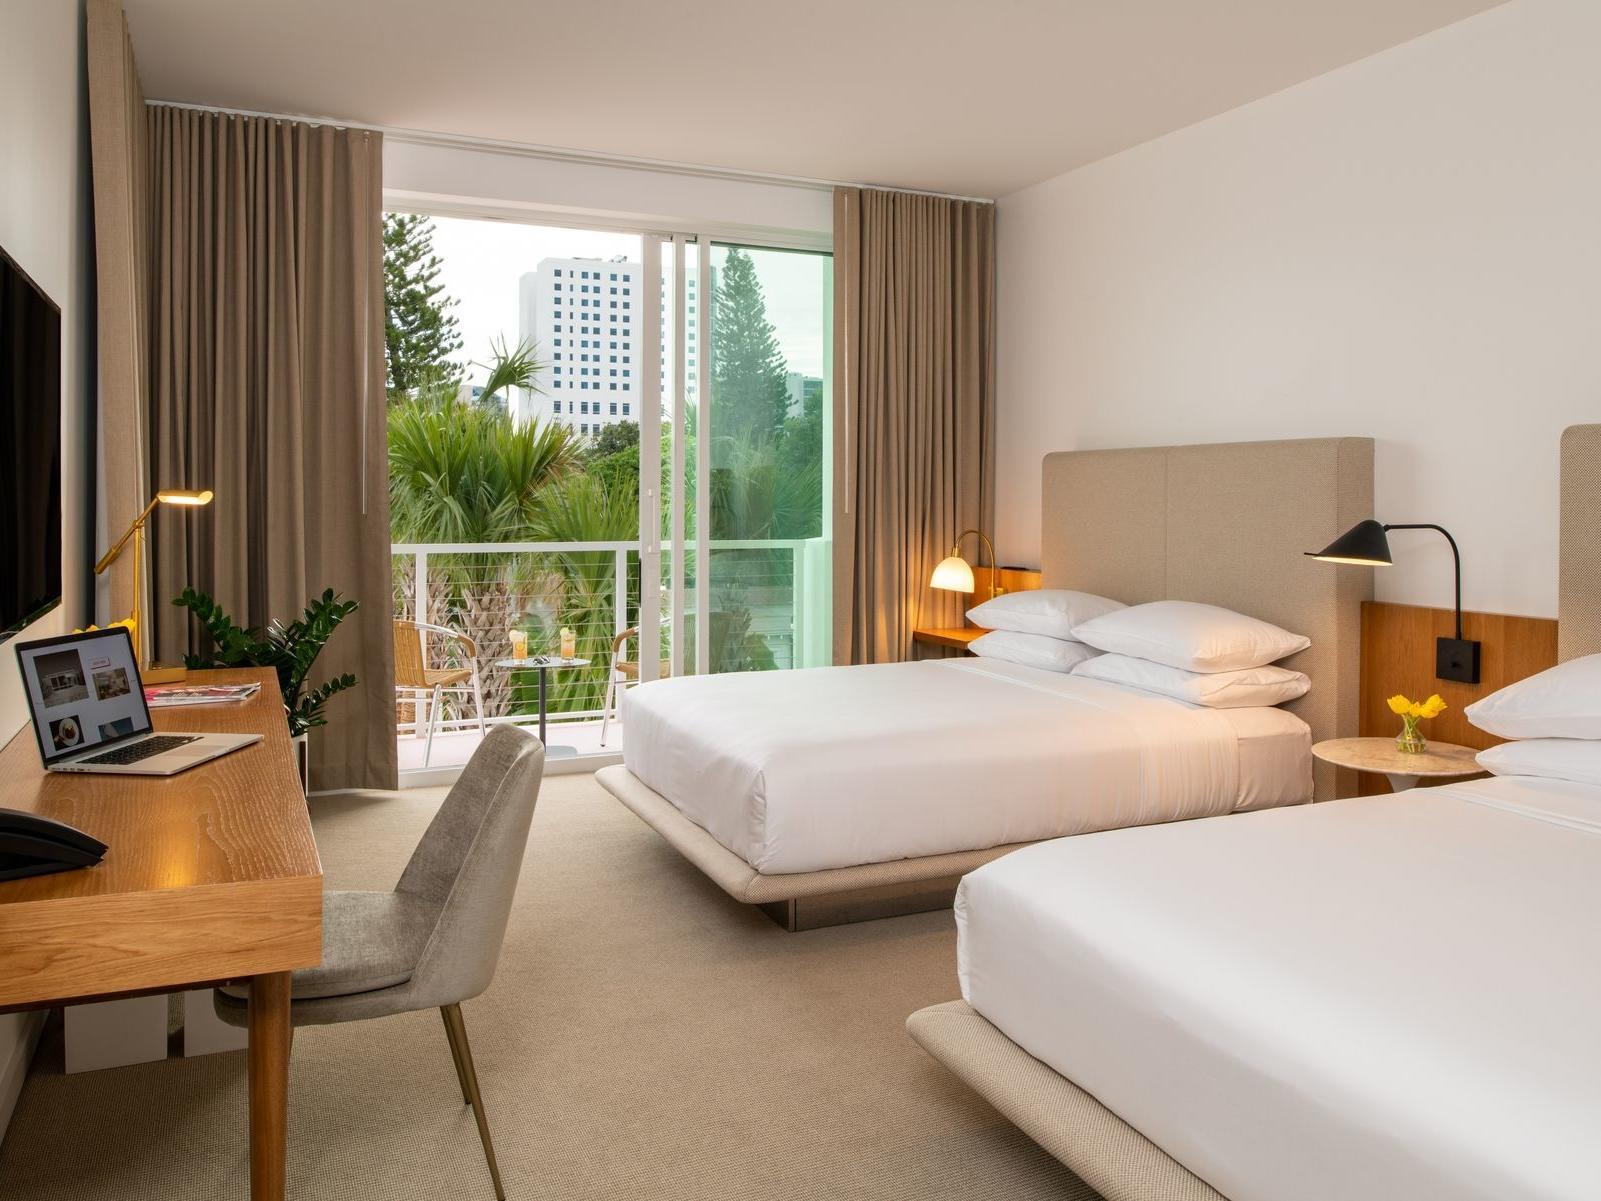 Super Downtown Sarasota Rooms Suites The Sarasota Modern Theyellowbook Wood Chair Design Ideas Theyellowbookinfo